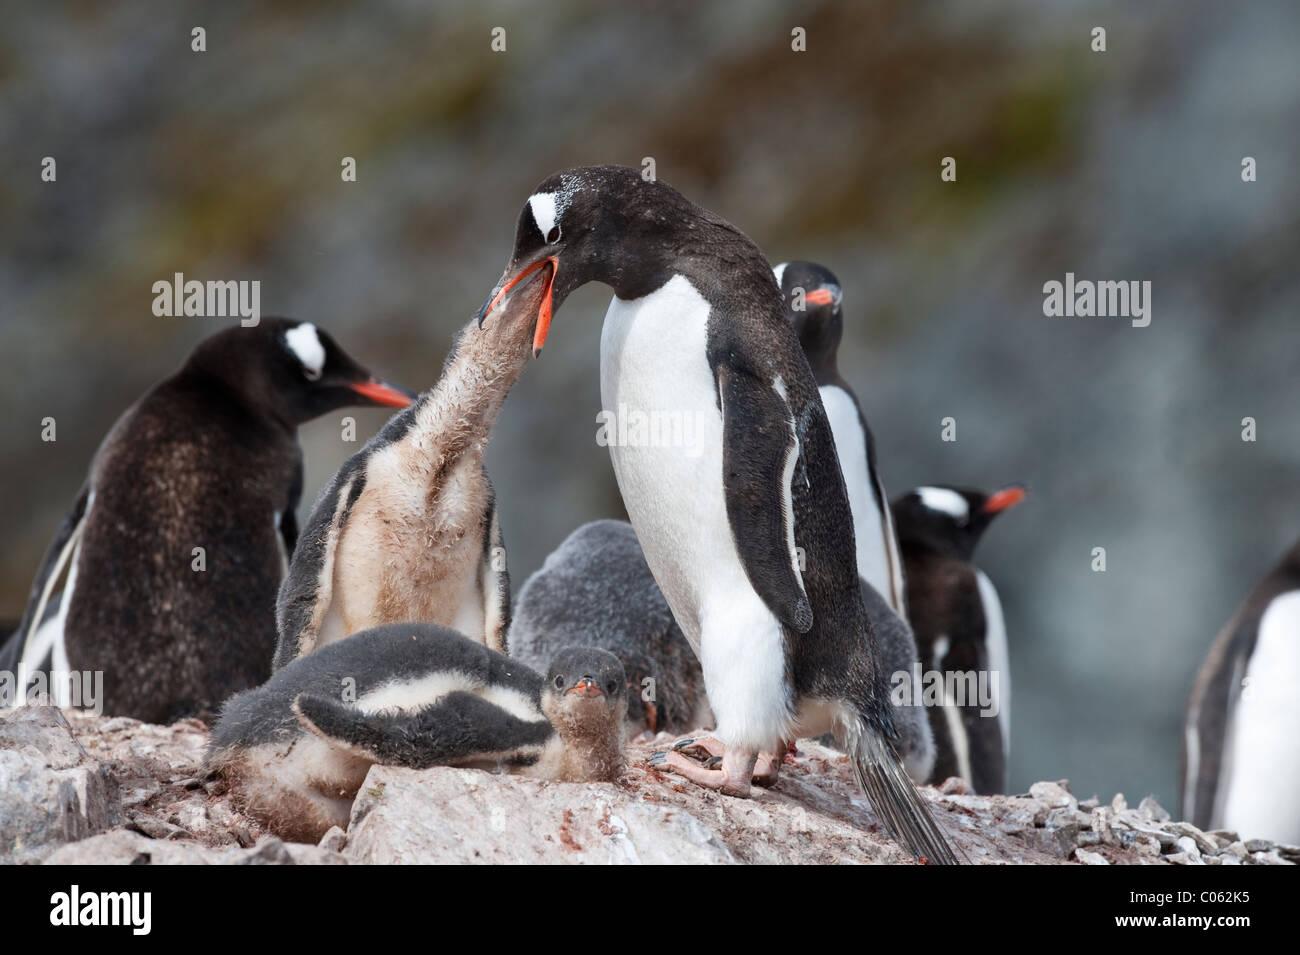 Gentoo Penguin feeding chick, Cuverville Island, Antarctica. - Stock Image